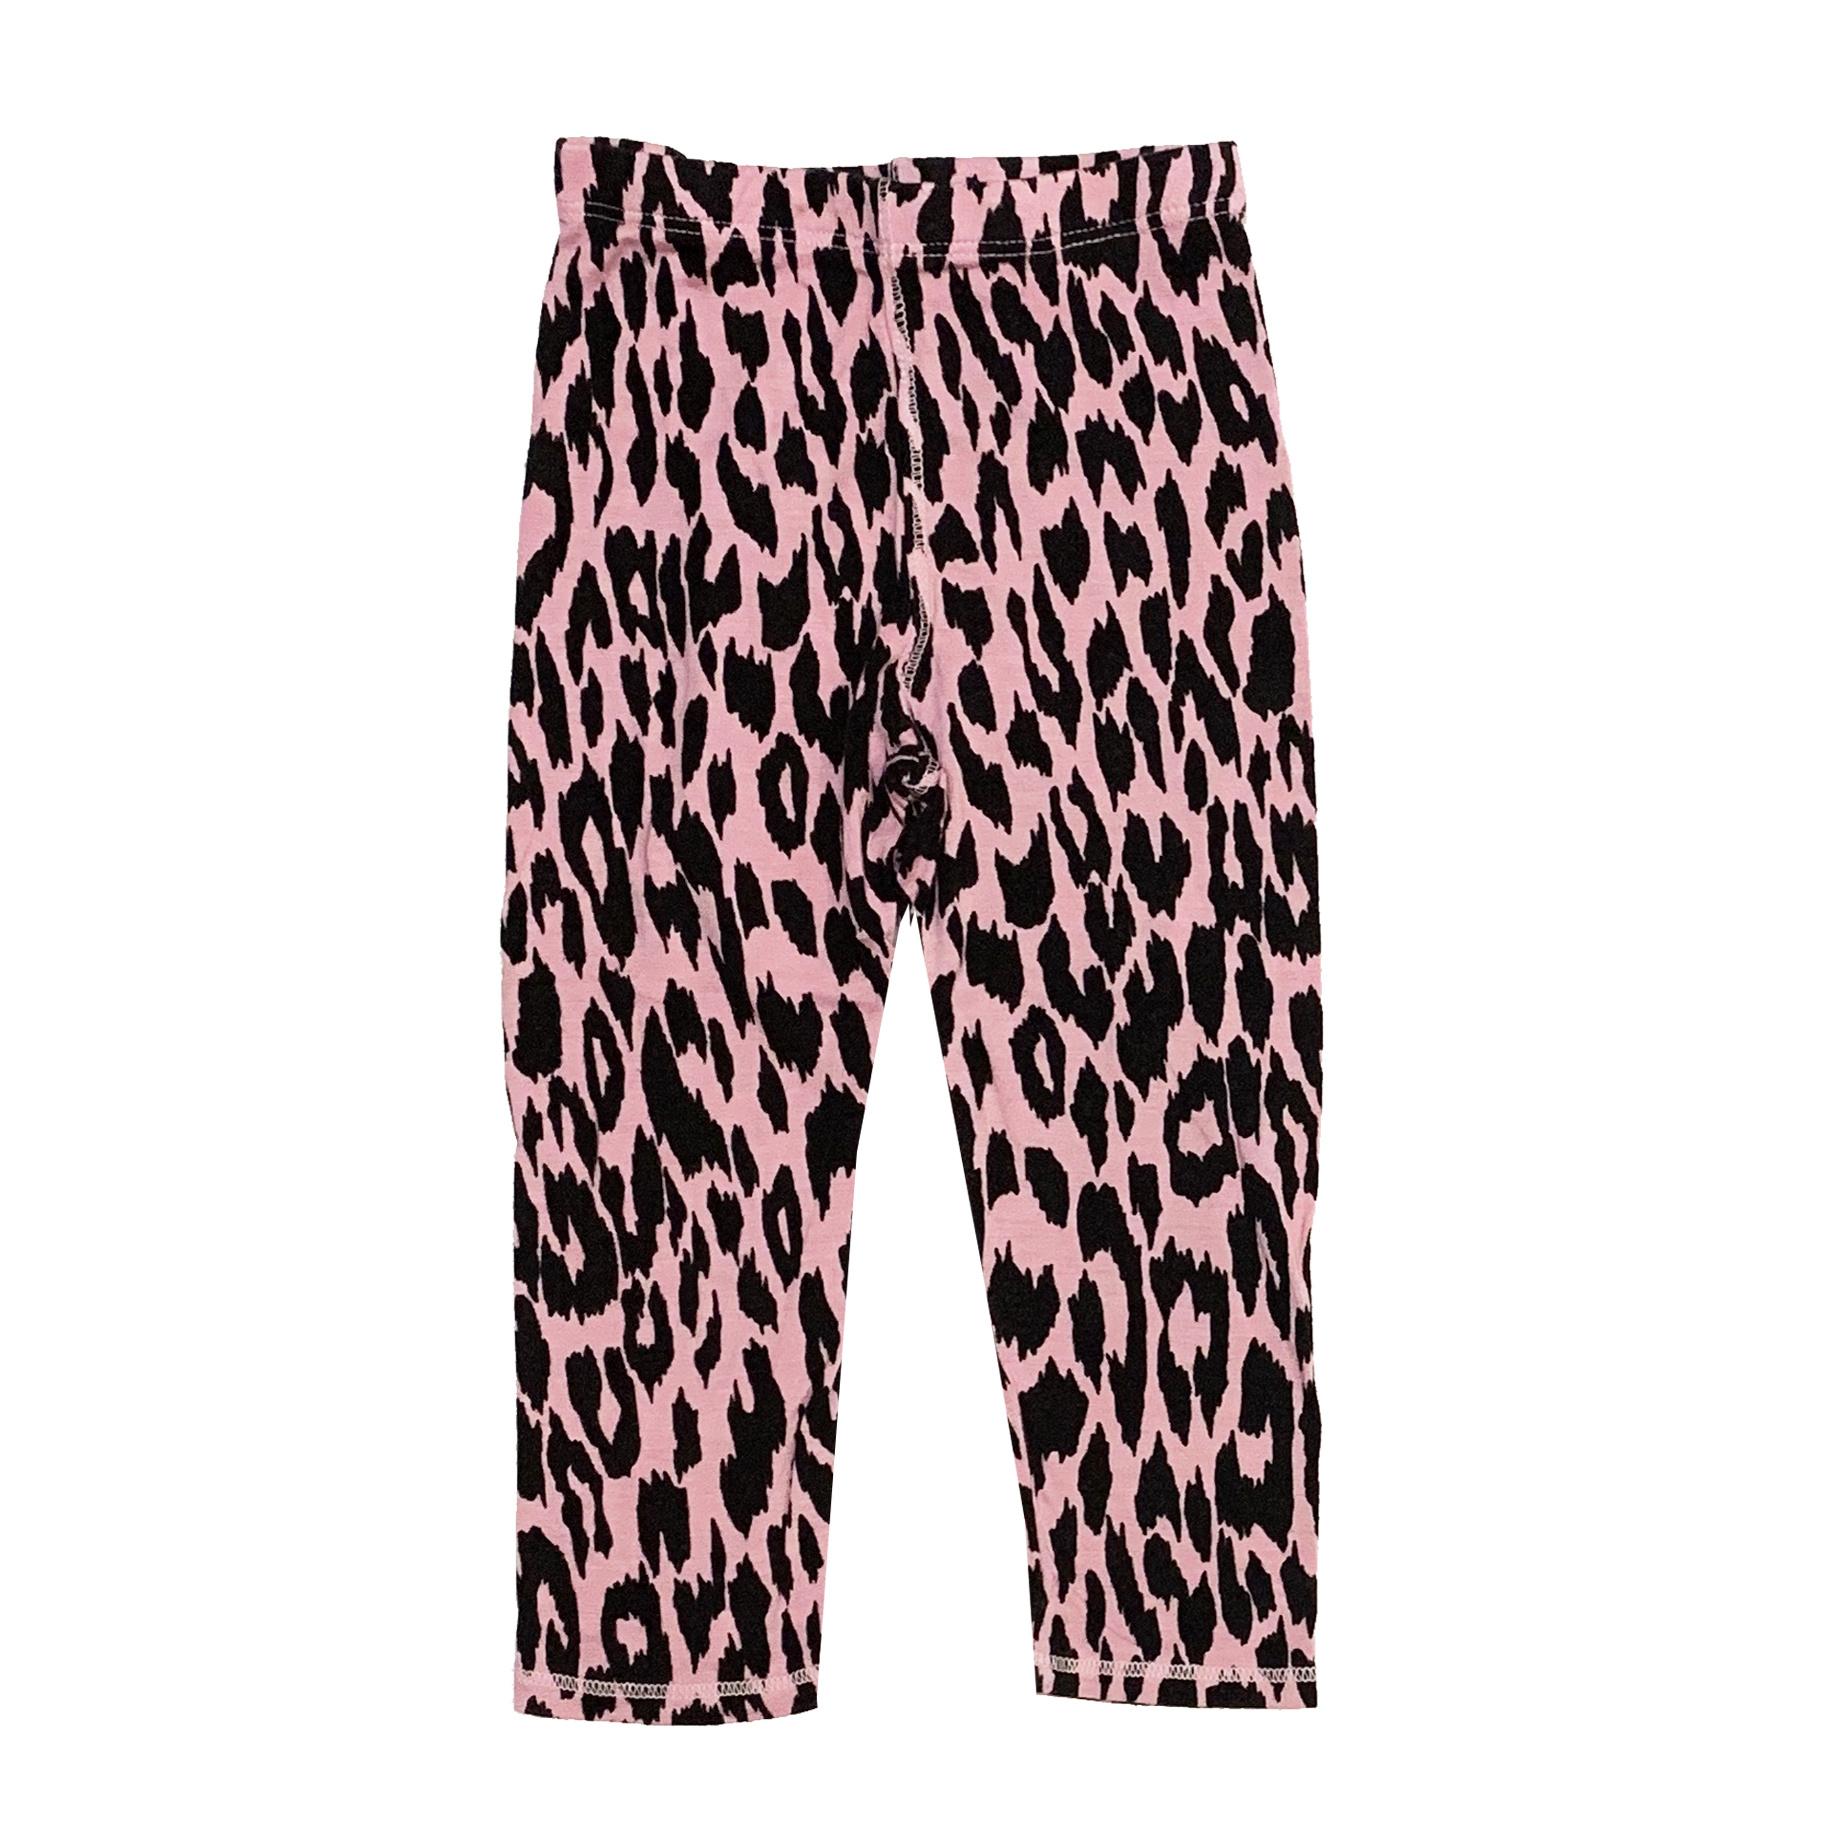 Cozii Pink Leopard Legging